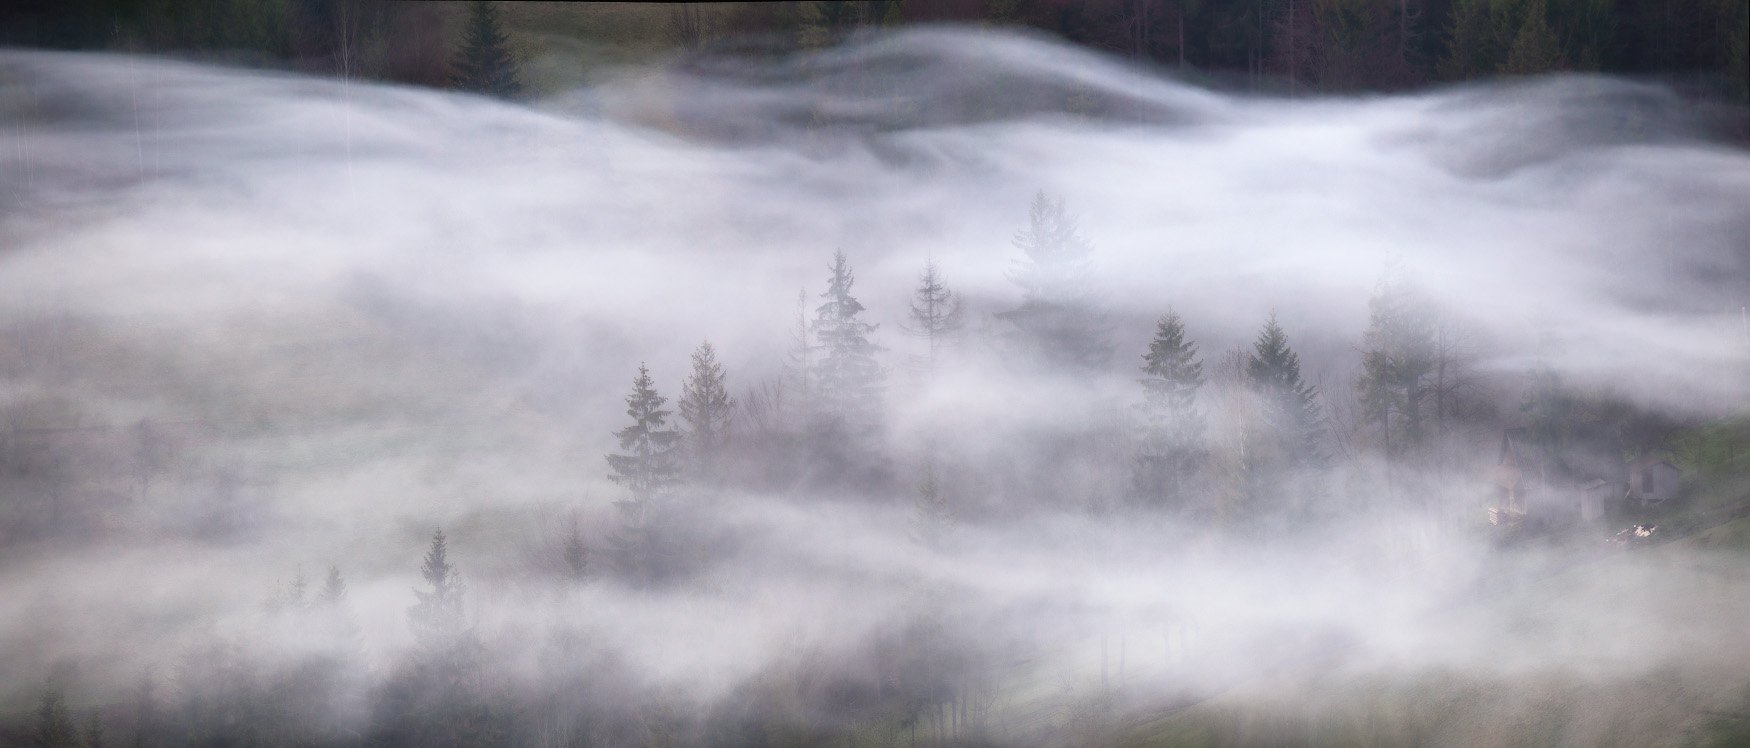 Весна, Карпаты, Май, Туман, Украина, Утро, Вейзе Максим